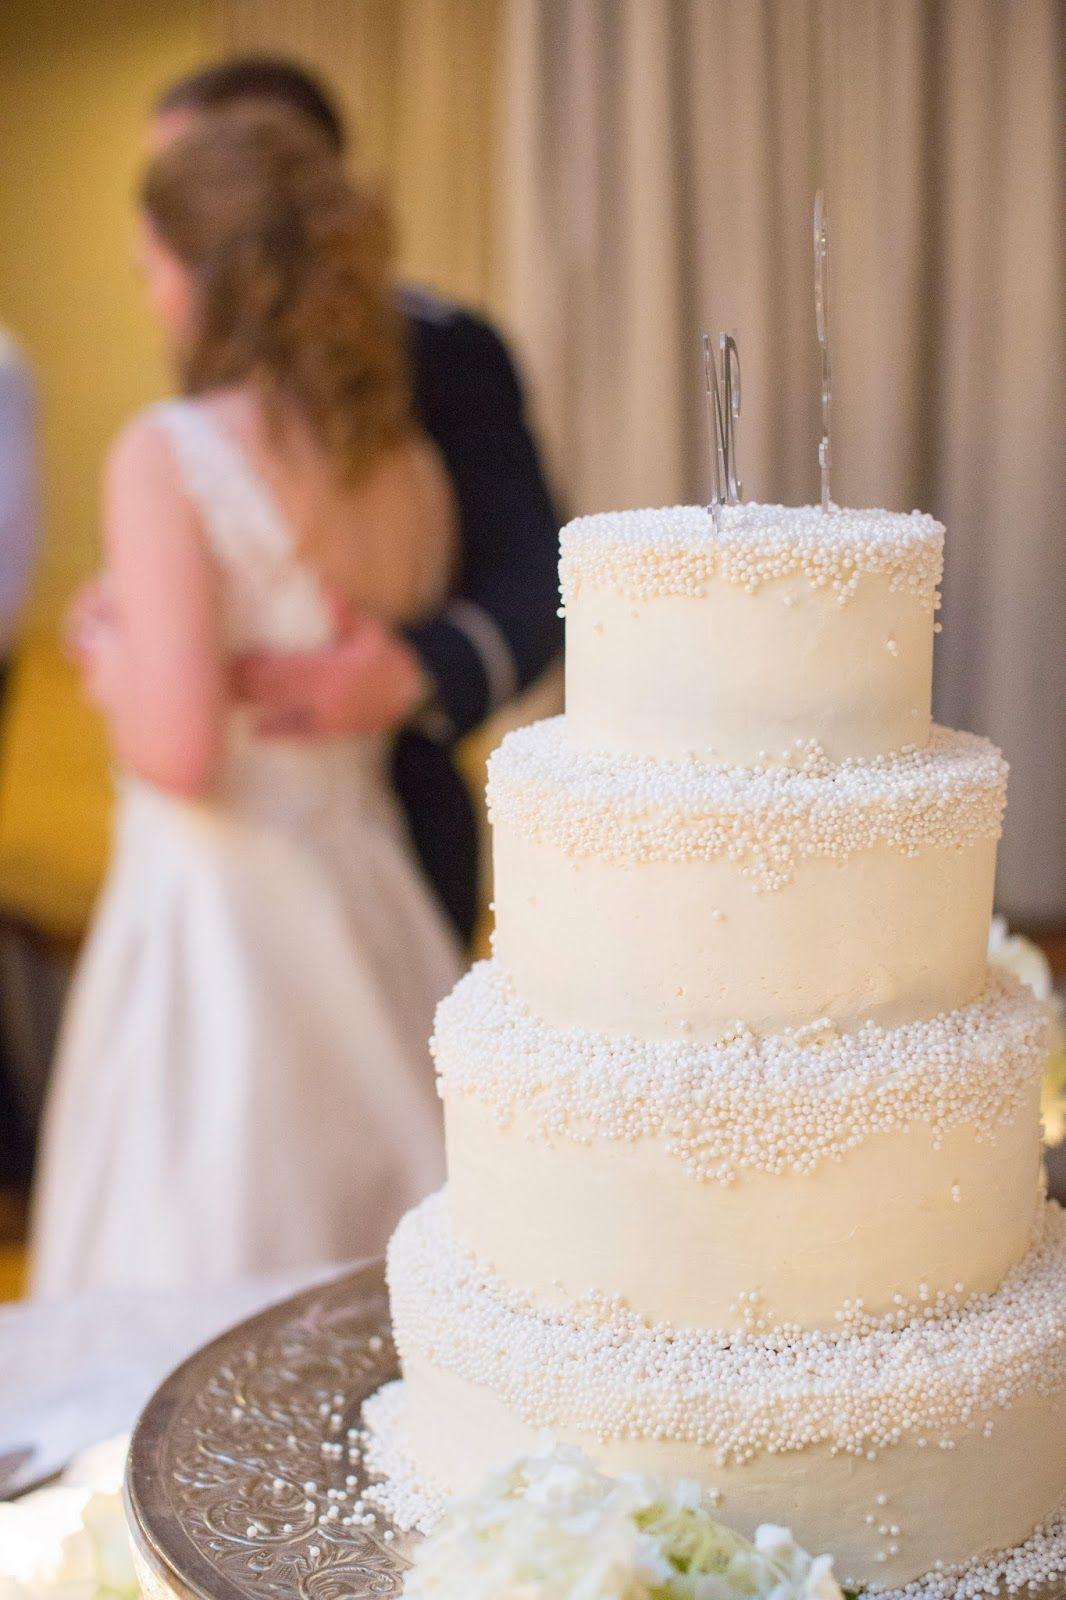 A Snowy Winter Wedding Cake Photo TY Photography Sweet Emma Lou Virginia Beach